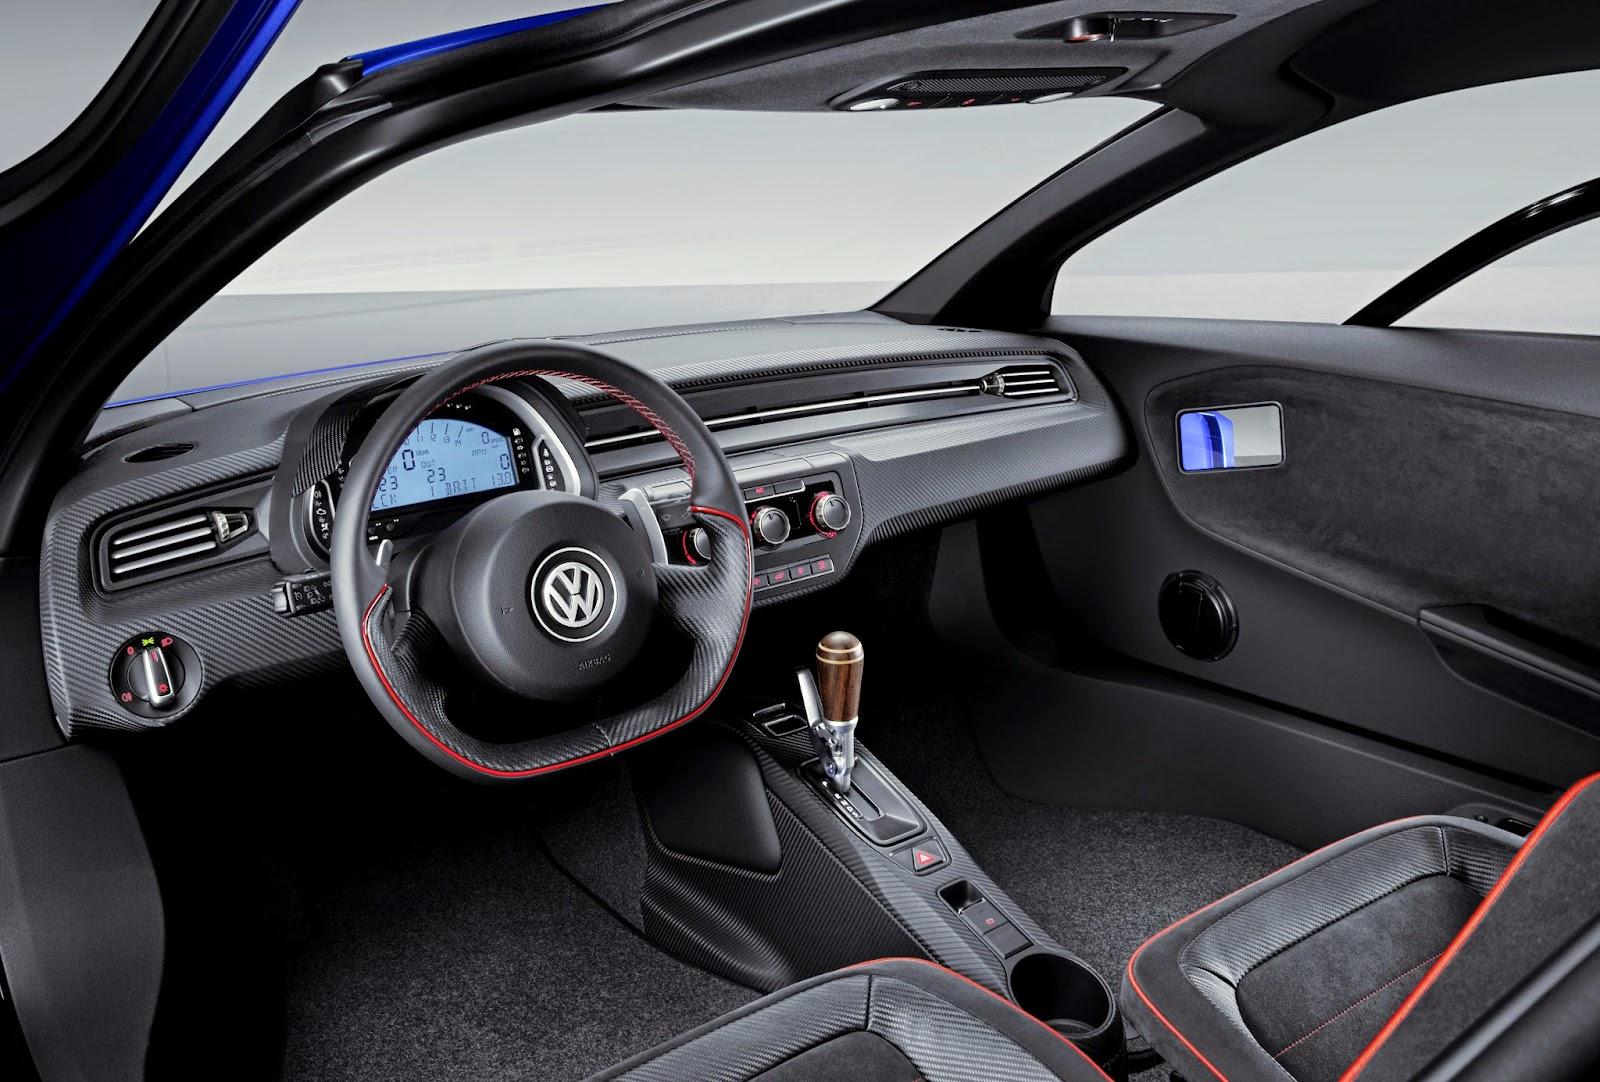 Volkswagen XL Sport Ducati Gives UltraEfficient VW More Power